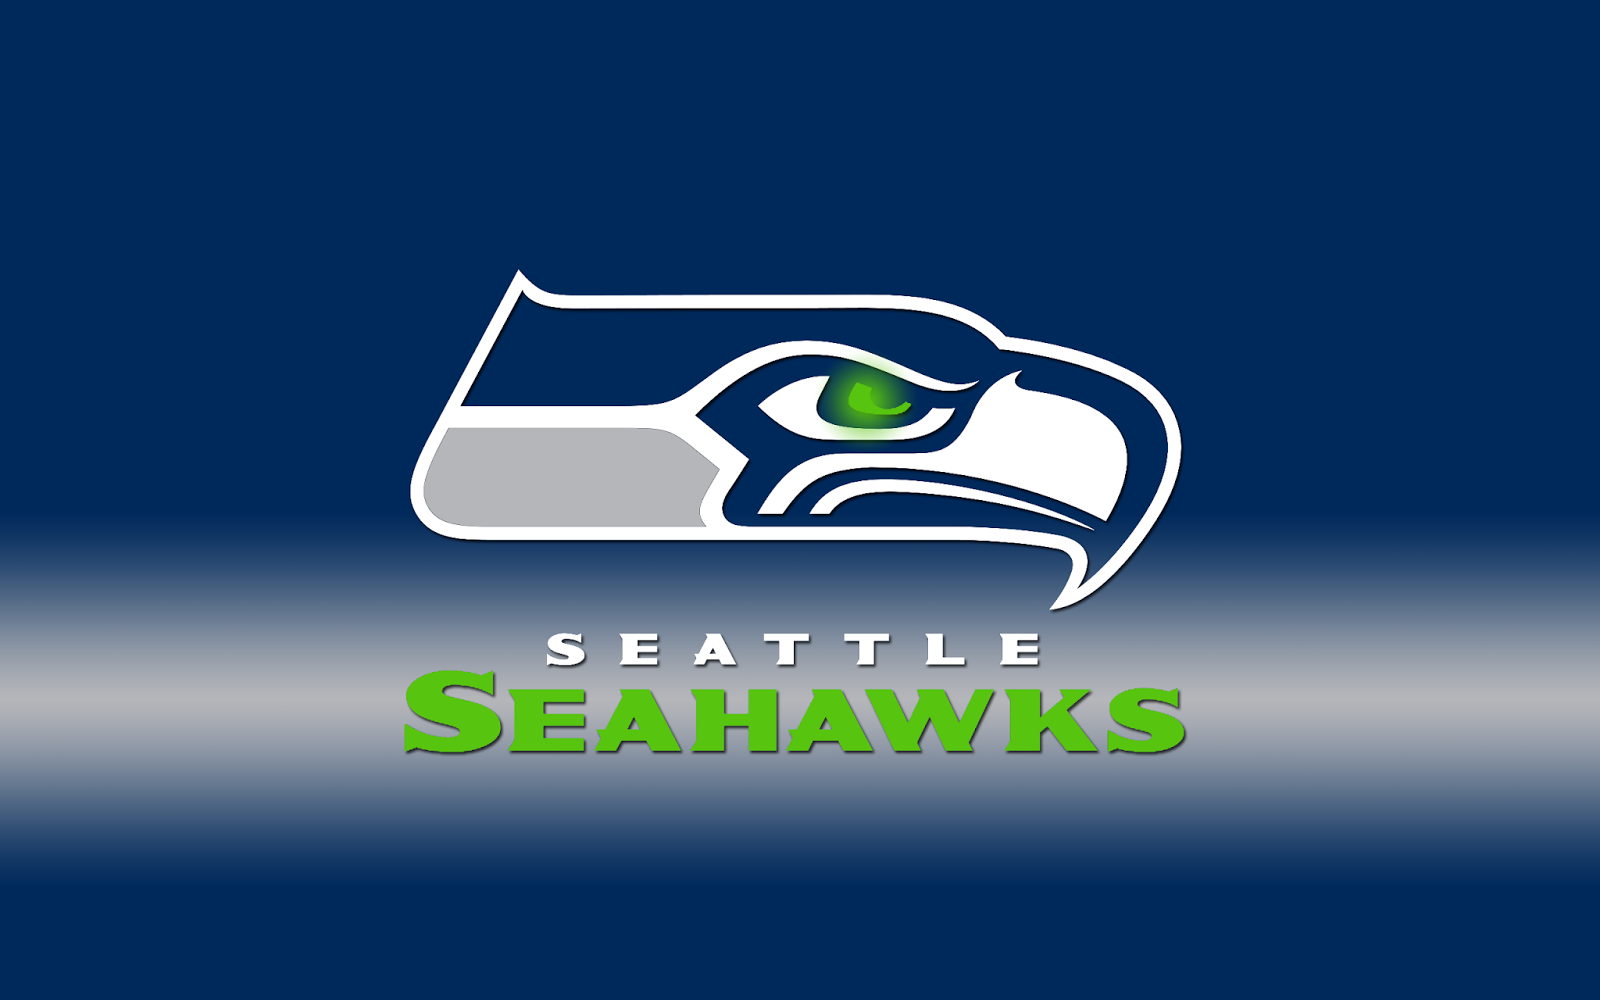 73 Seattle Seahawks Wallpaper On Wallpapersafari